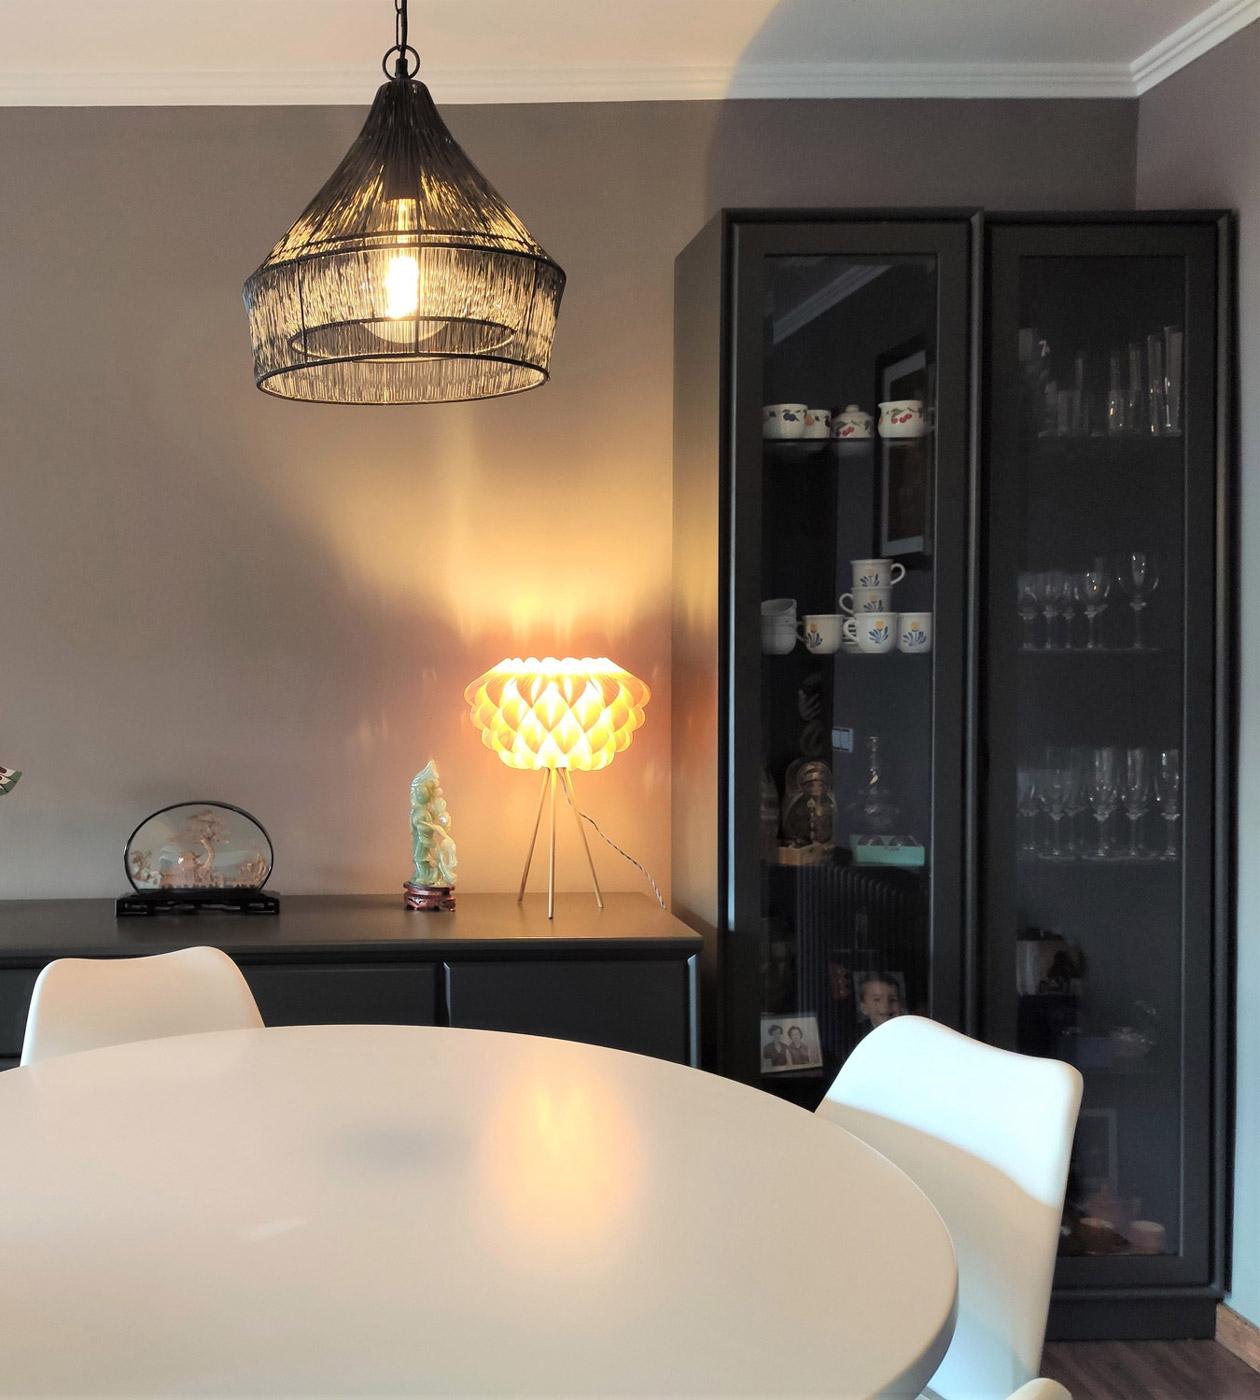 atelier-4-anna-junca-reforma-reformes-interiorista-arquitectura-interior-disseny-interiors-banyoles-girona-costa-brava-emporda-habitatge-comercial-relooking-menjador-5